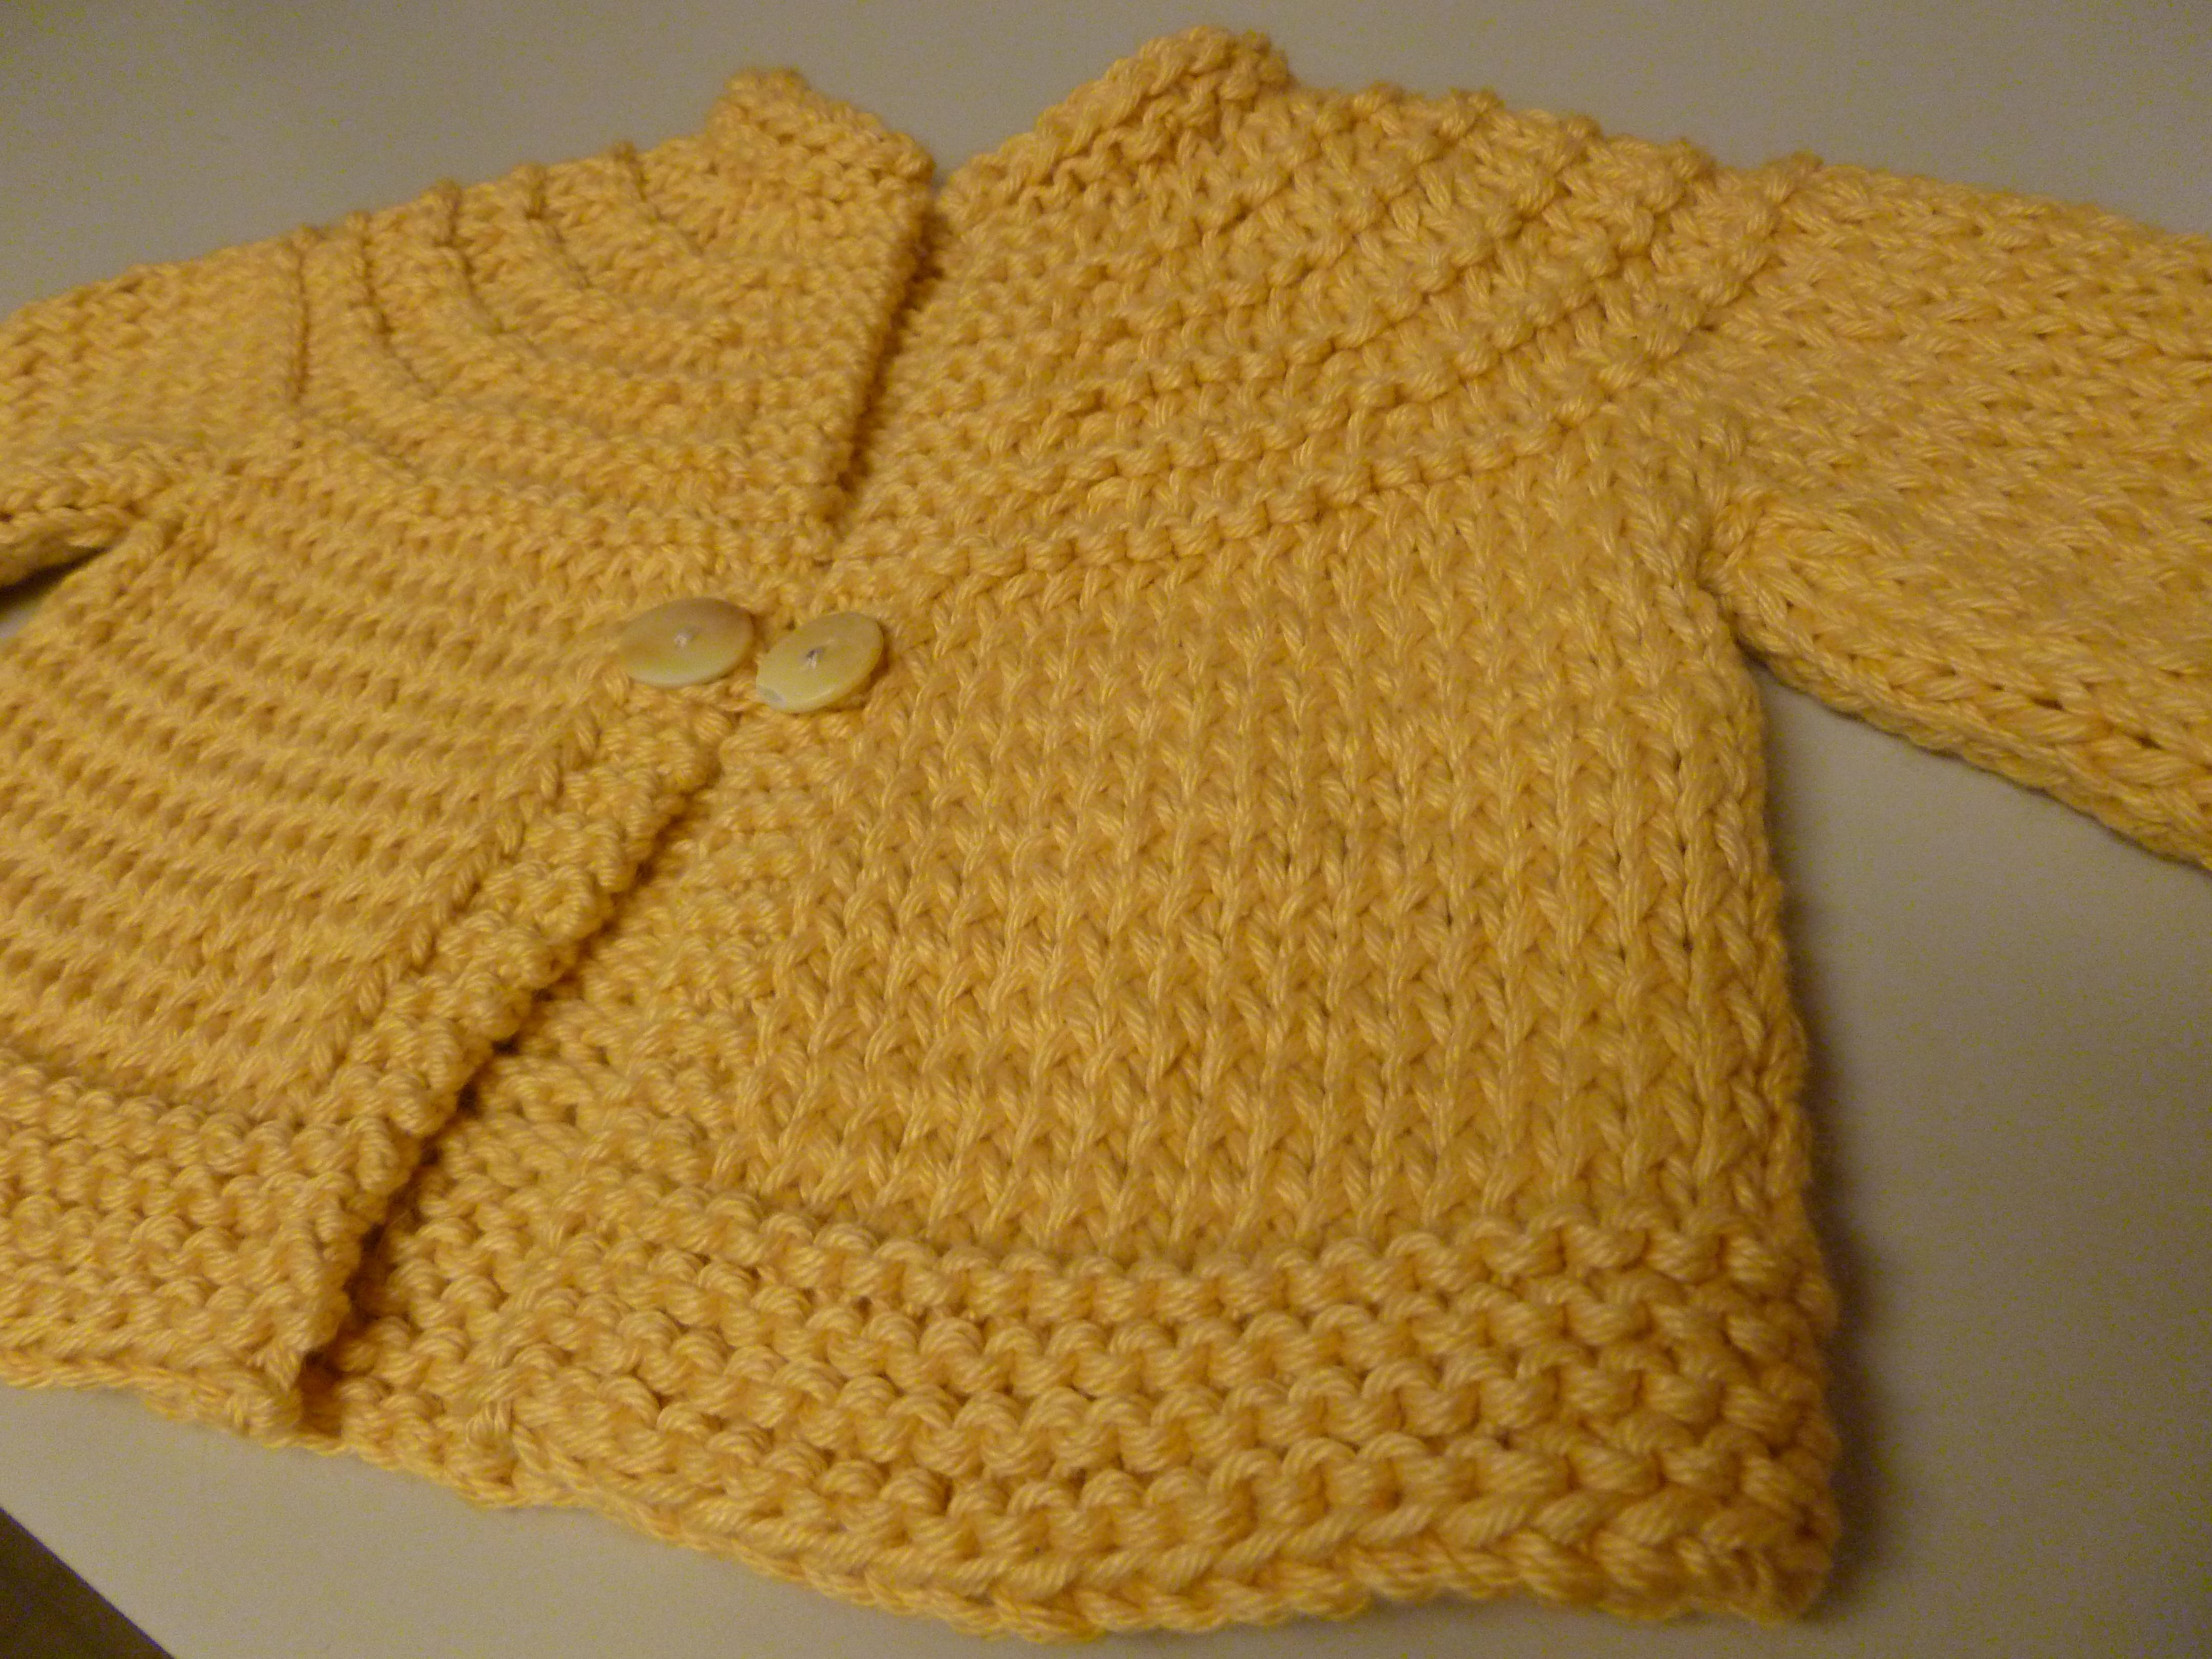 1401536f4e07 The (eventually) adorably precious baby sweater